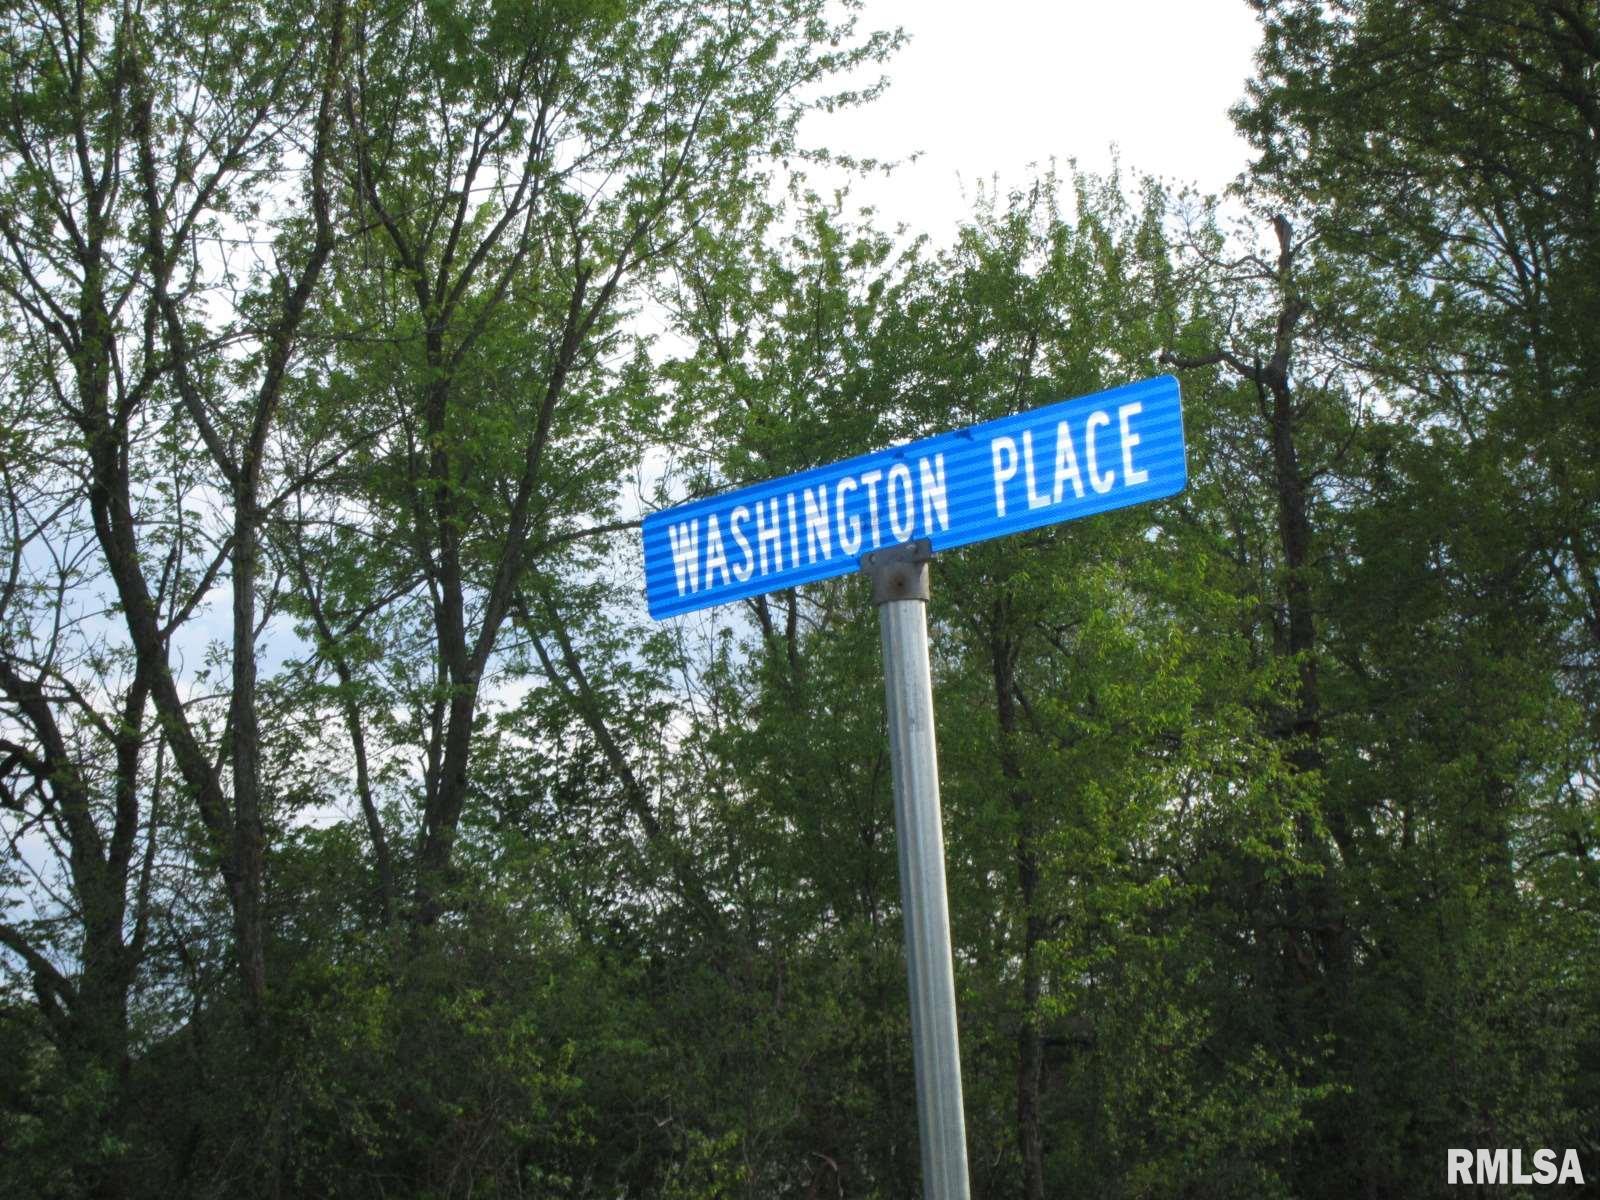 204 WASHINGTON Property Photo - Riverton, IL real estate listing